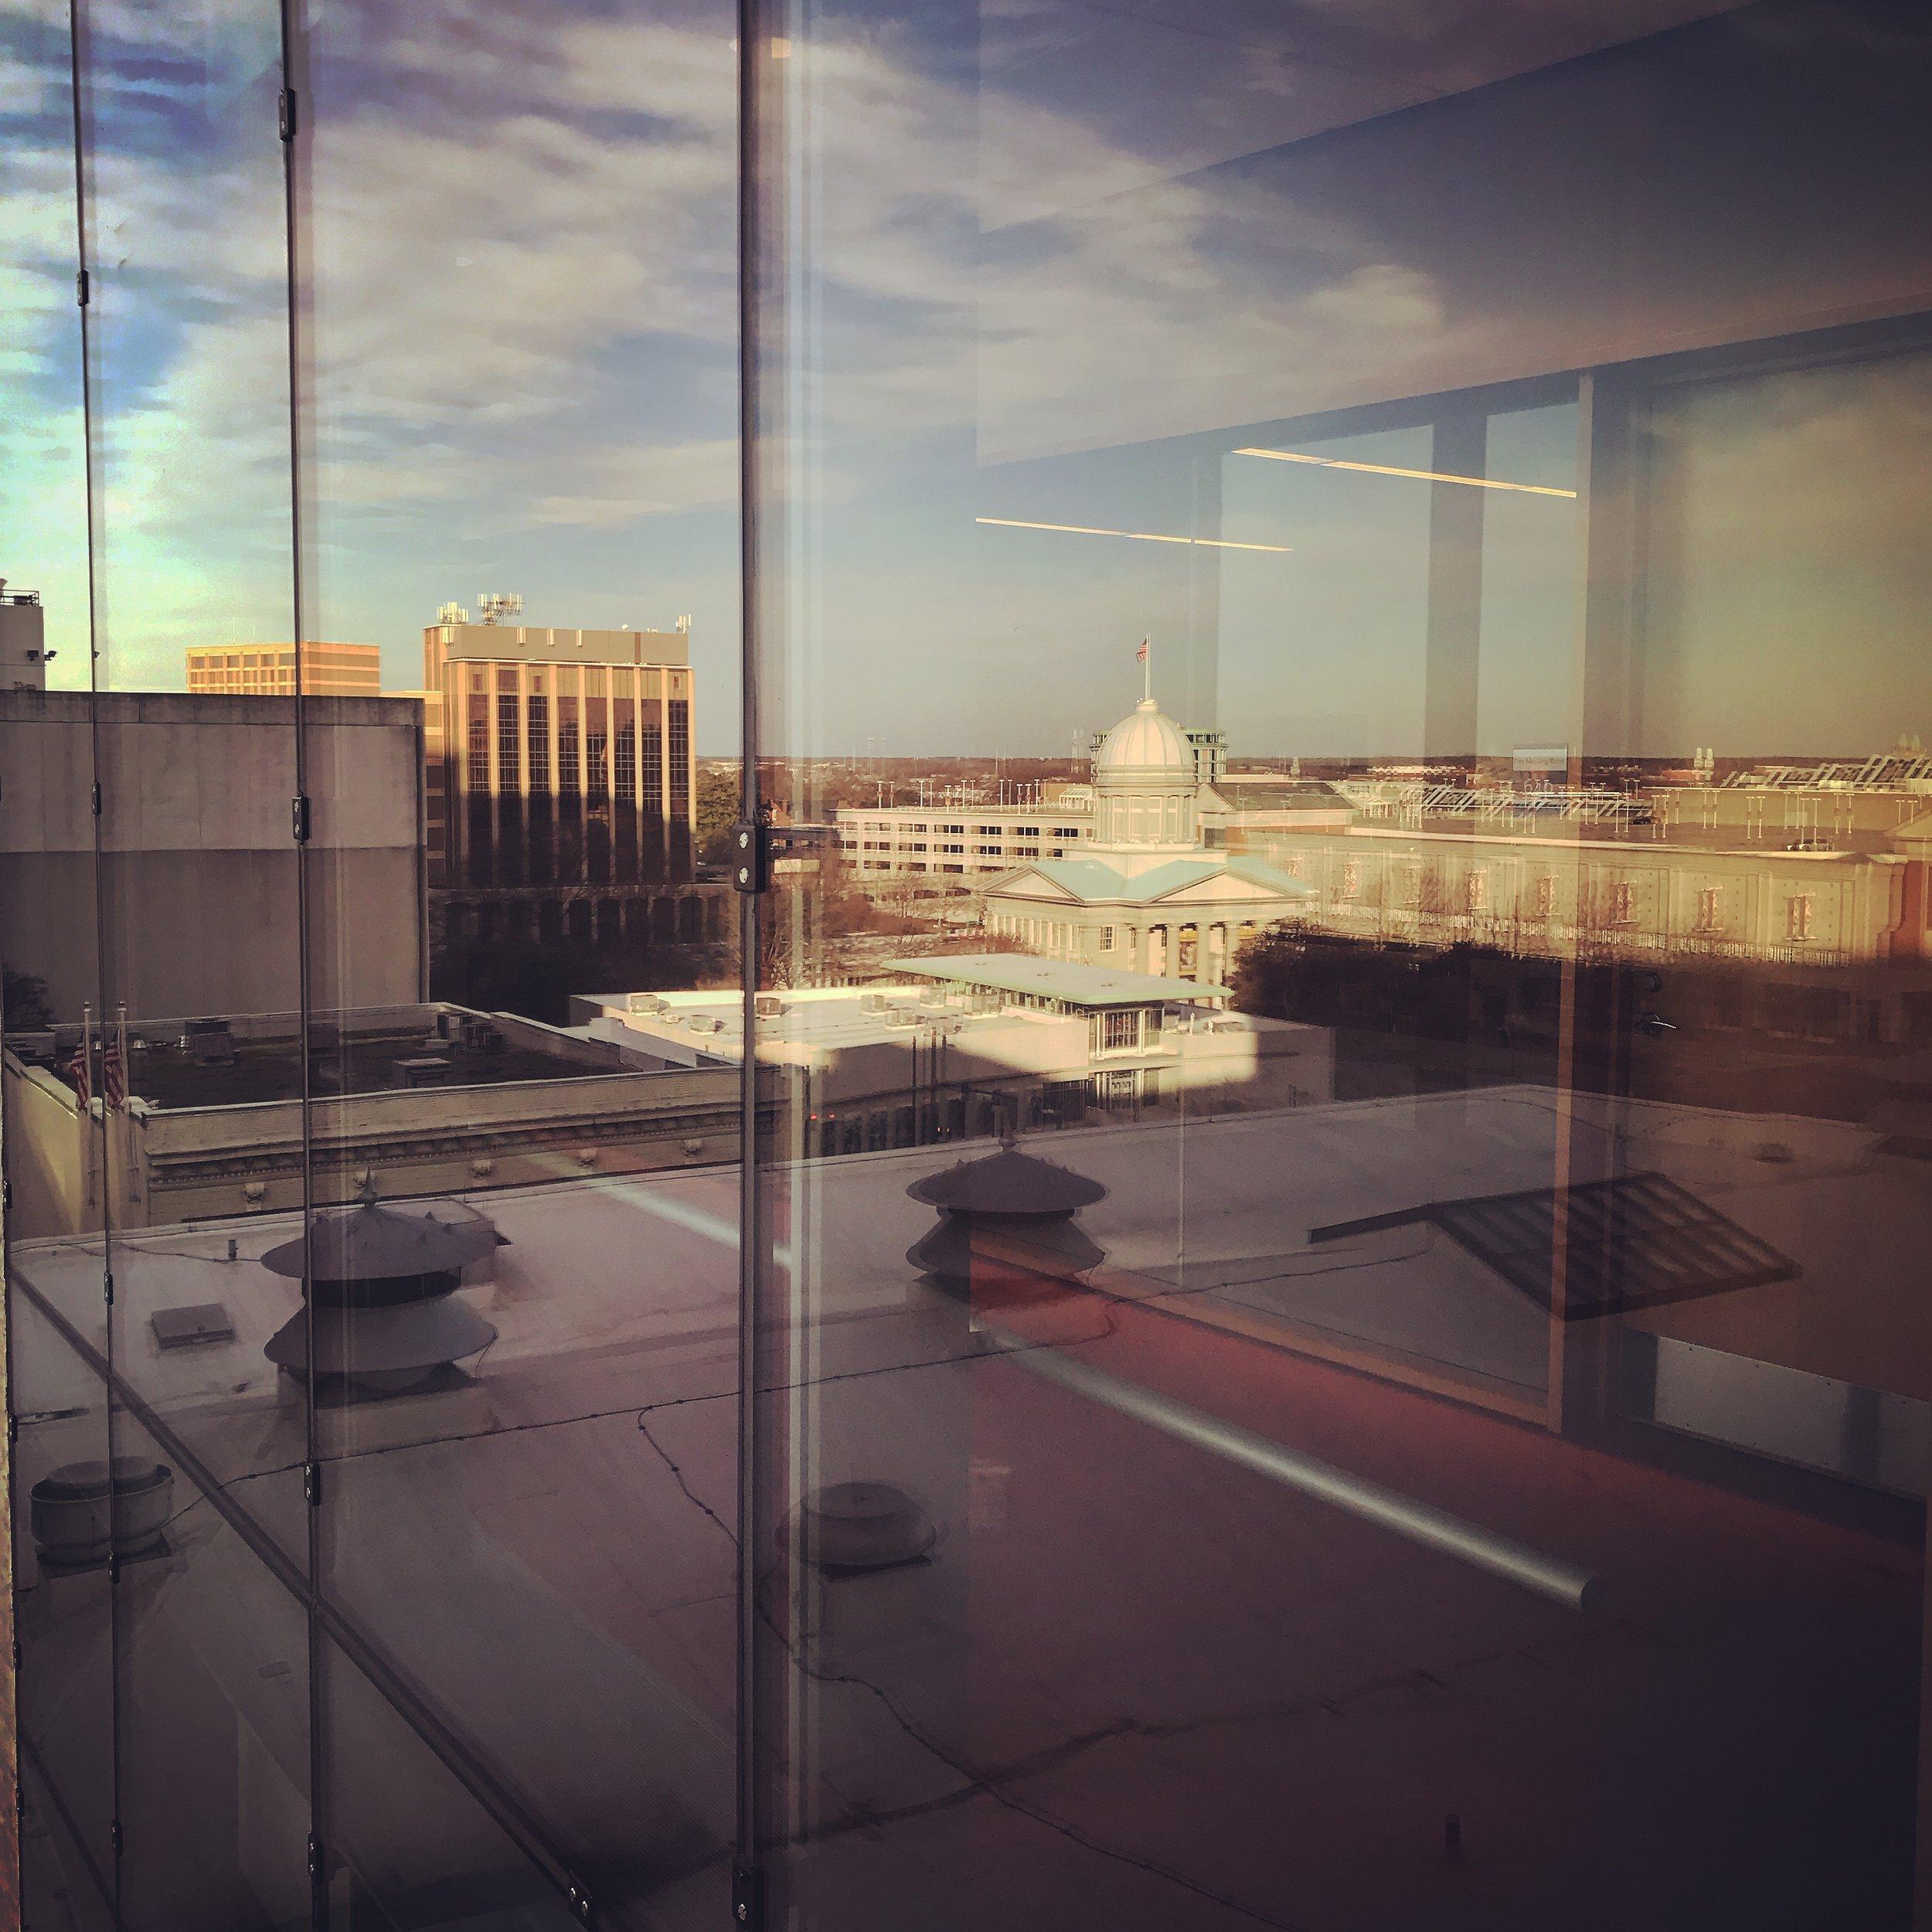 MacArthur Memorial reflected.